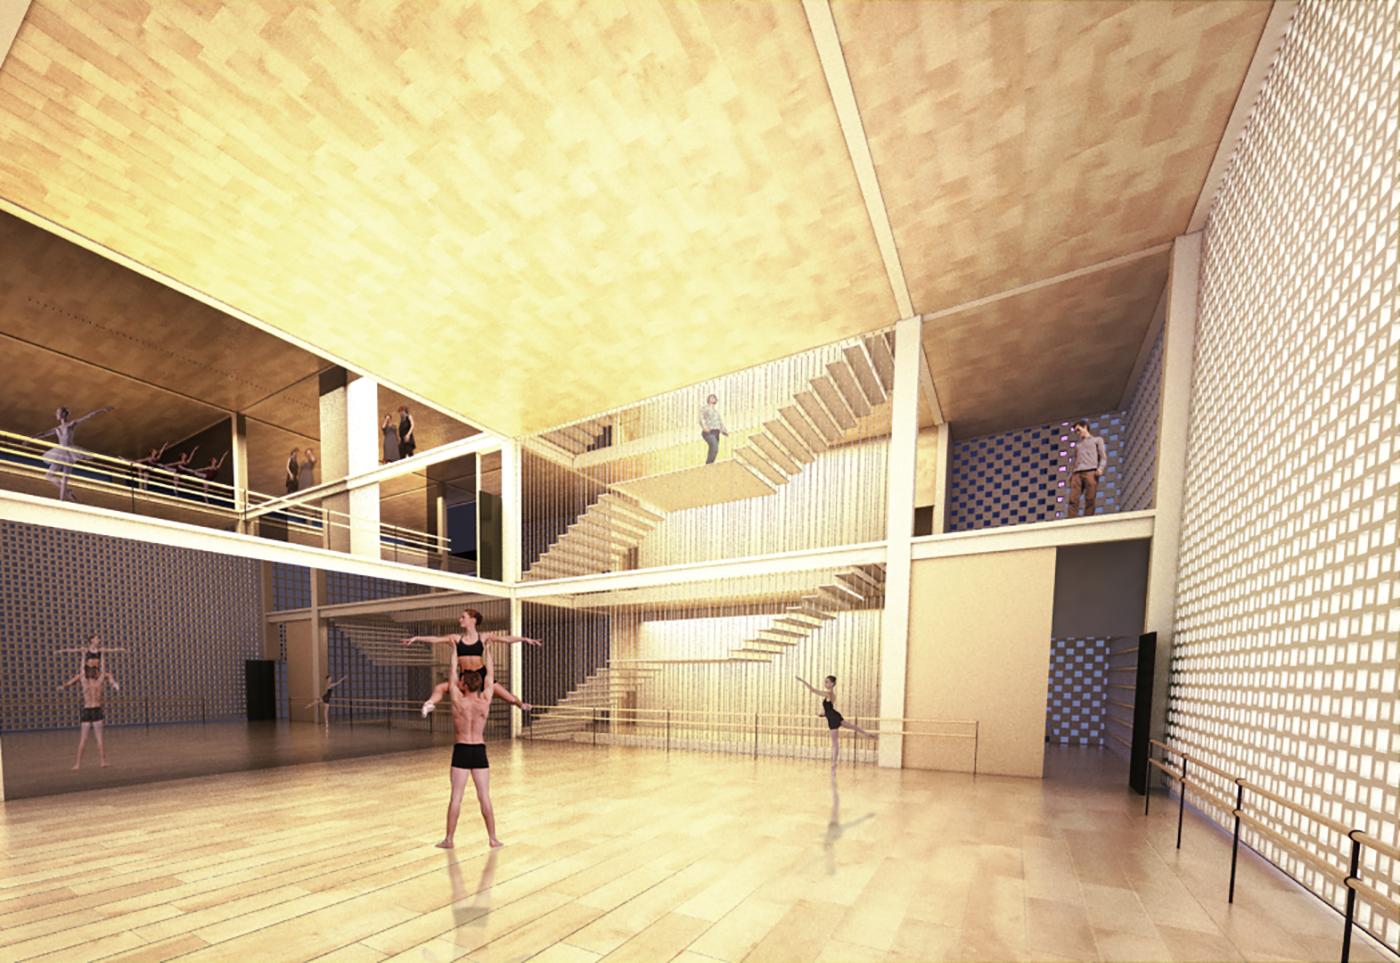 muta arquitetos_escola de danca musica e teatro 07